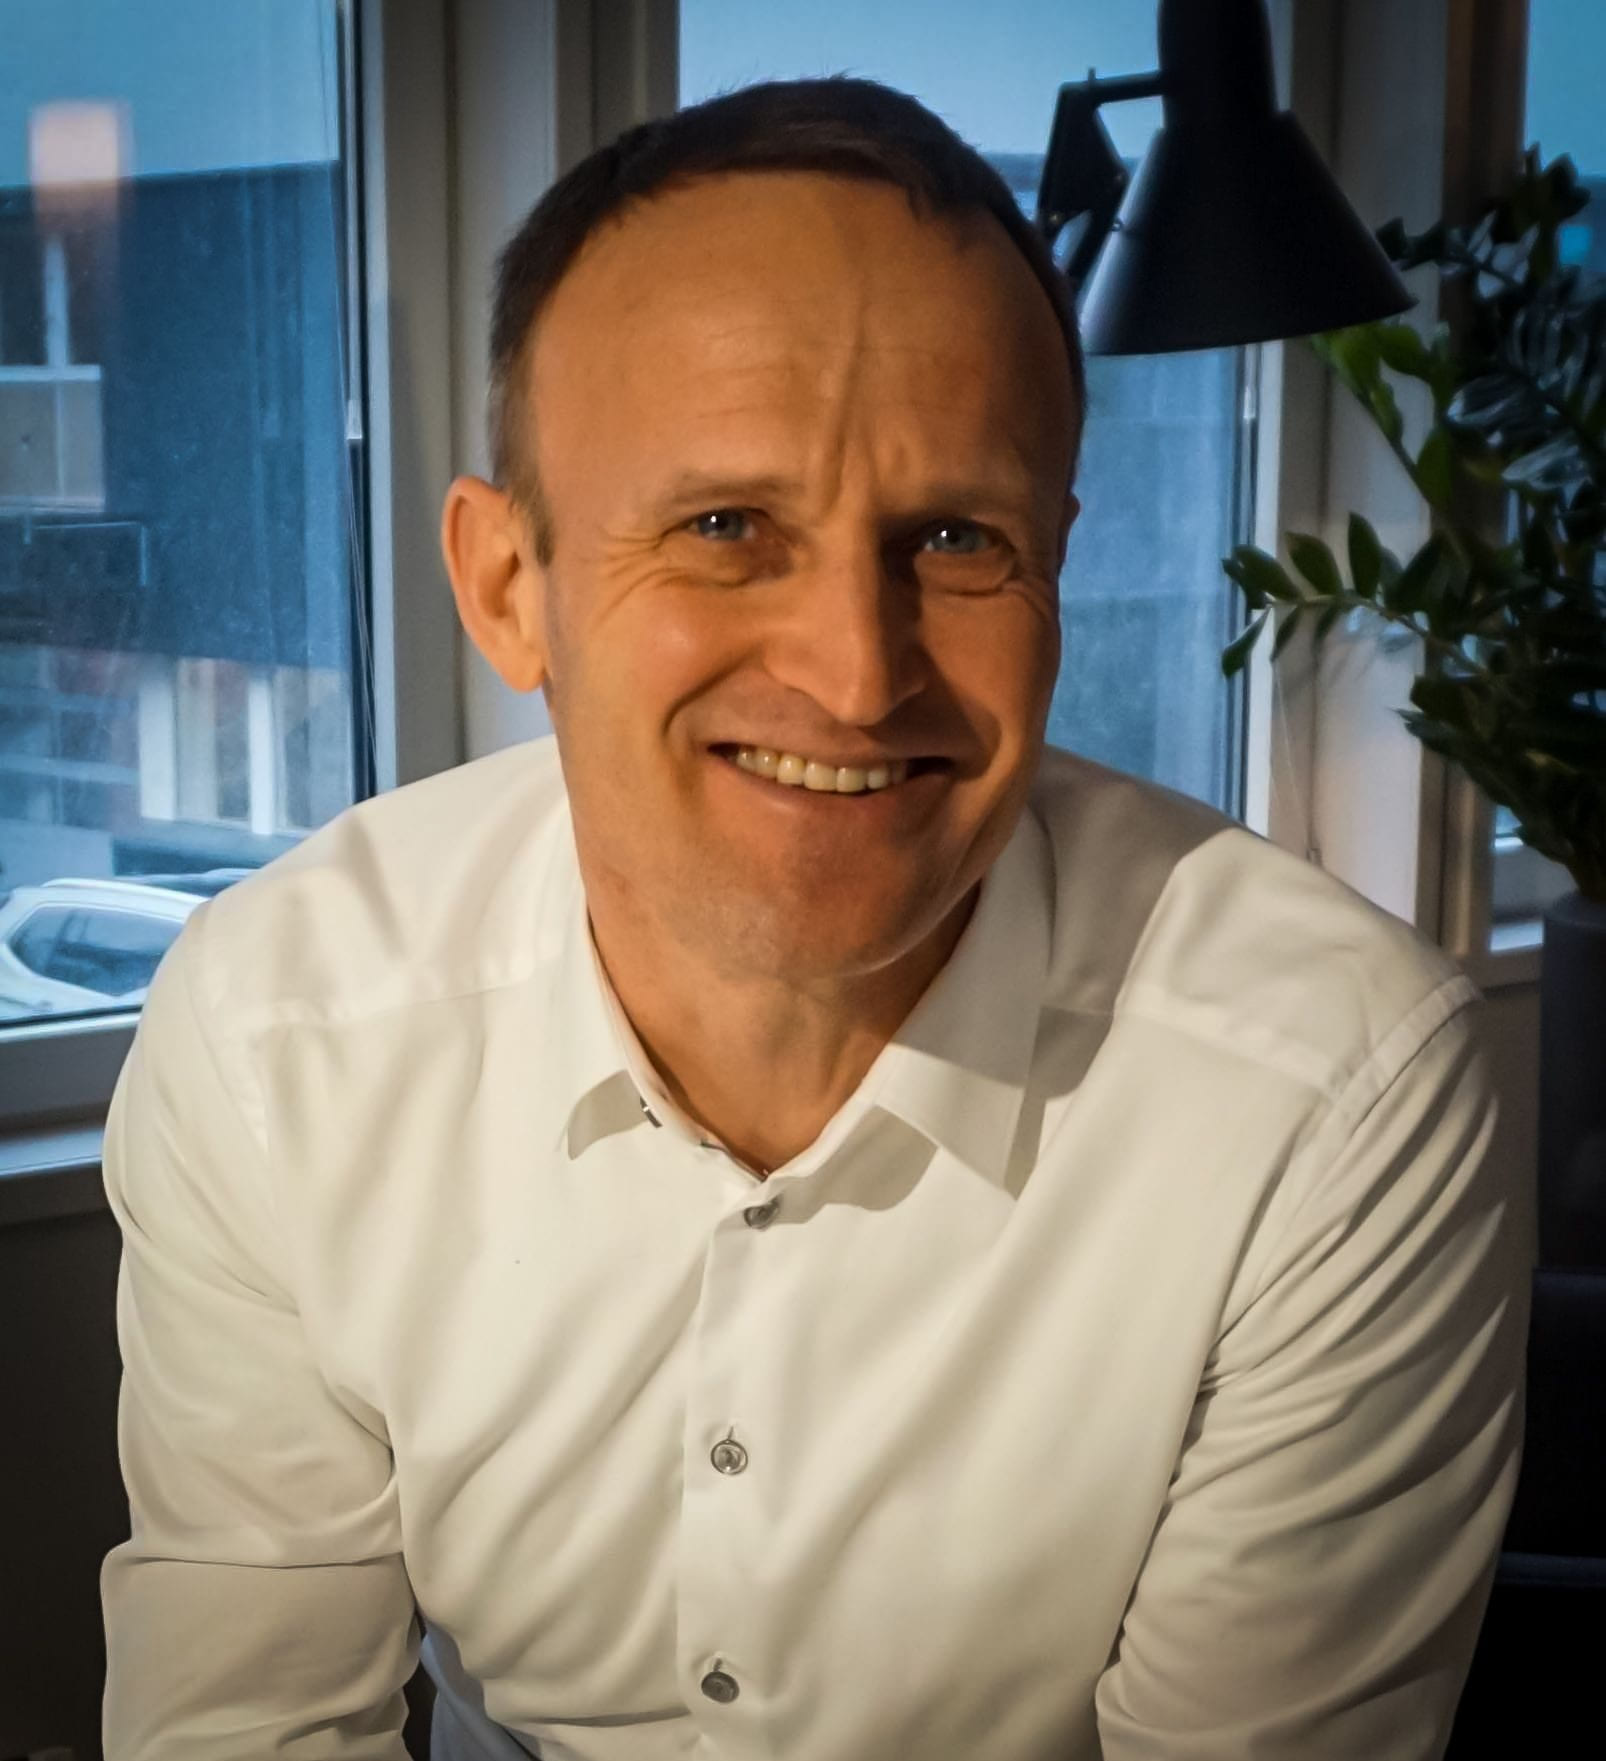 Håkon Bakkevig